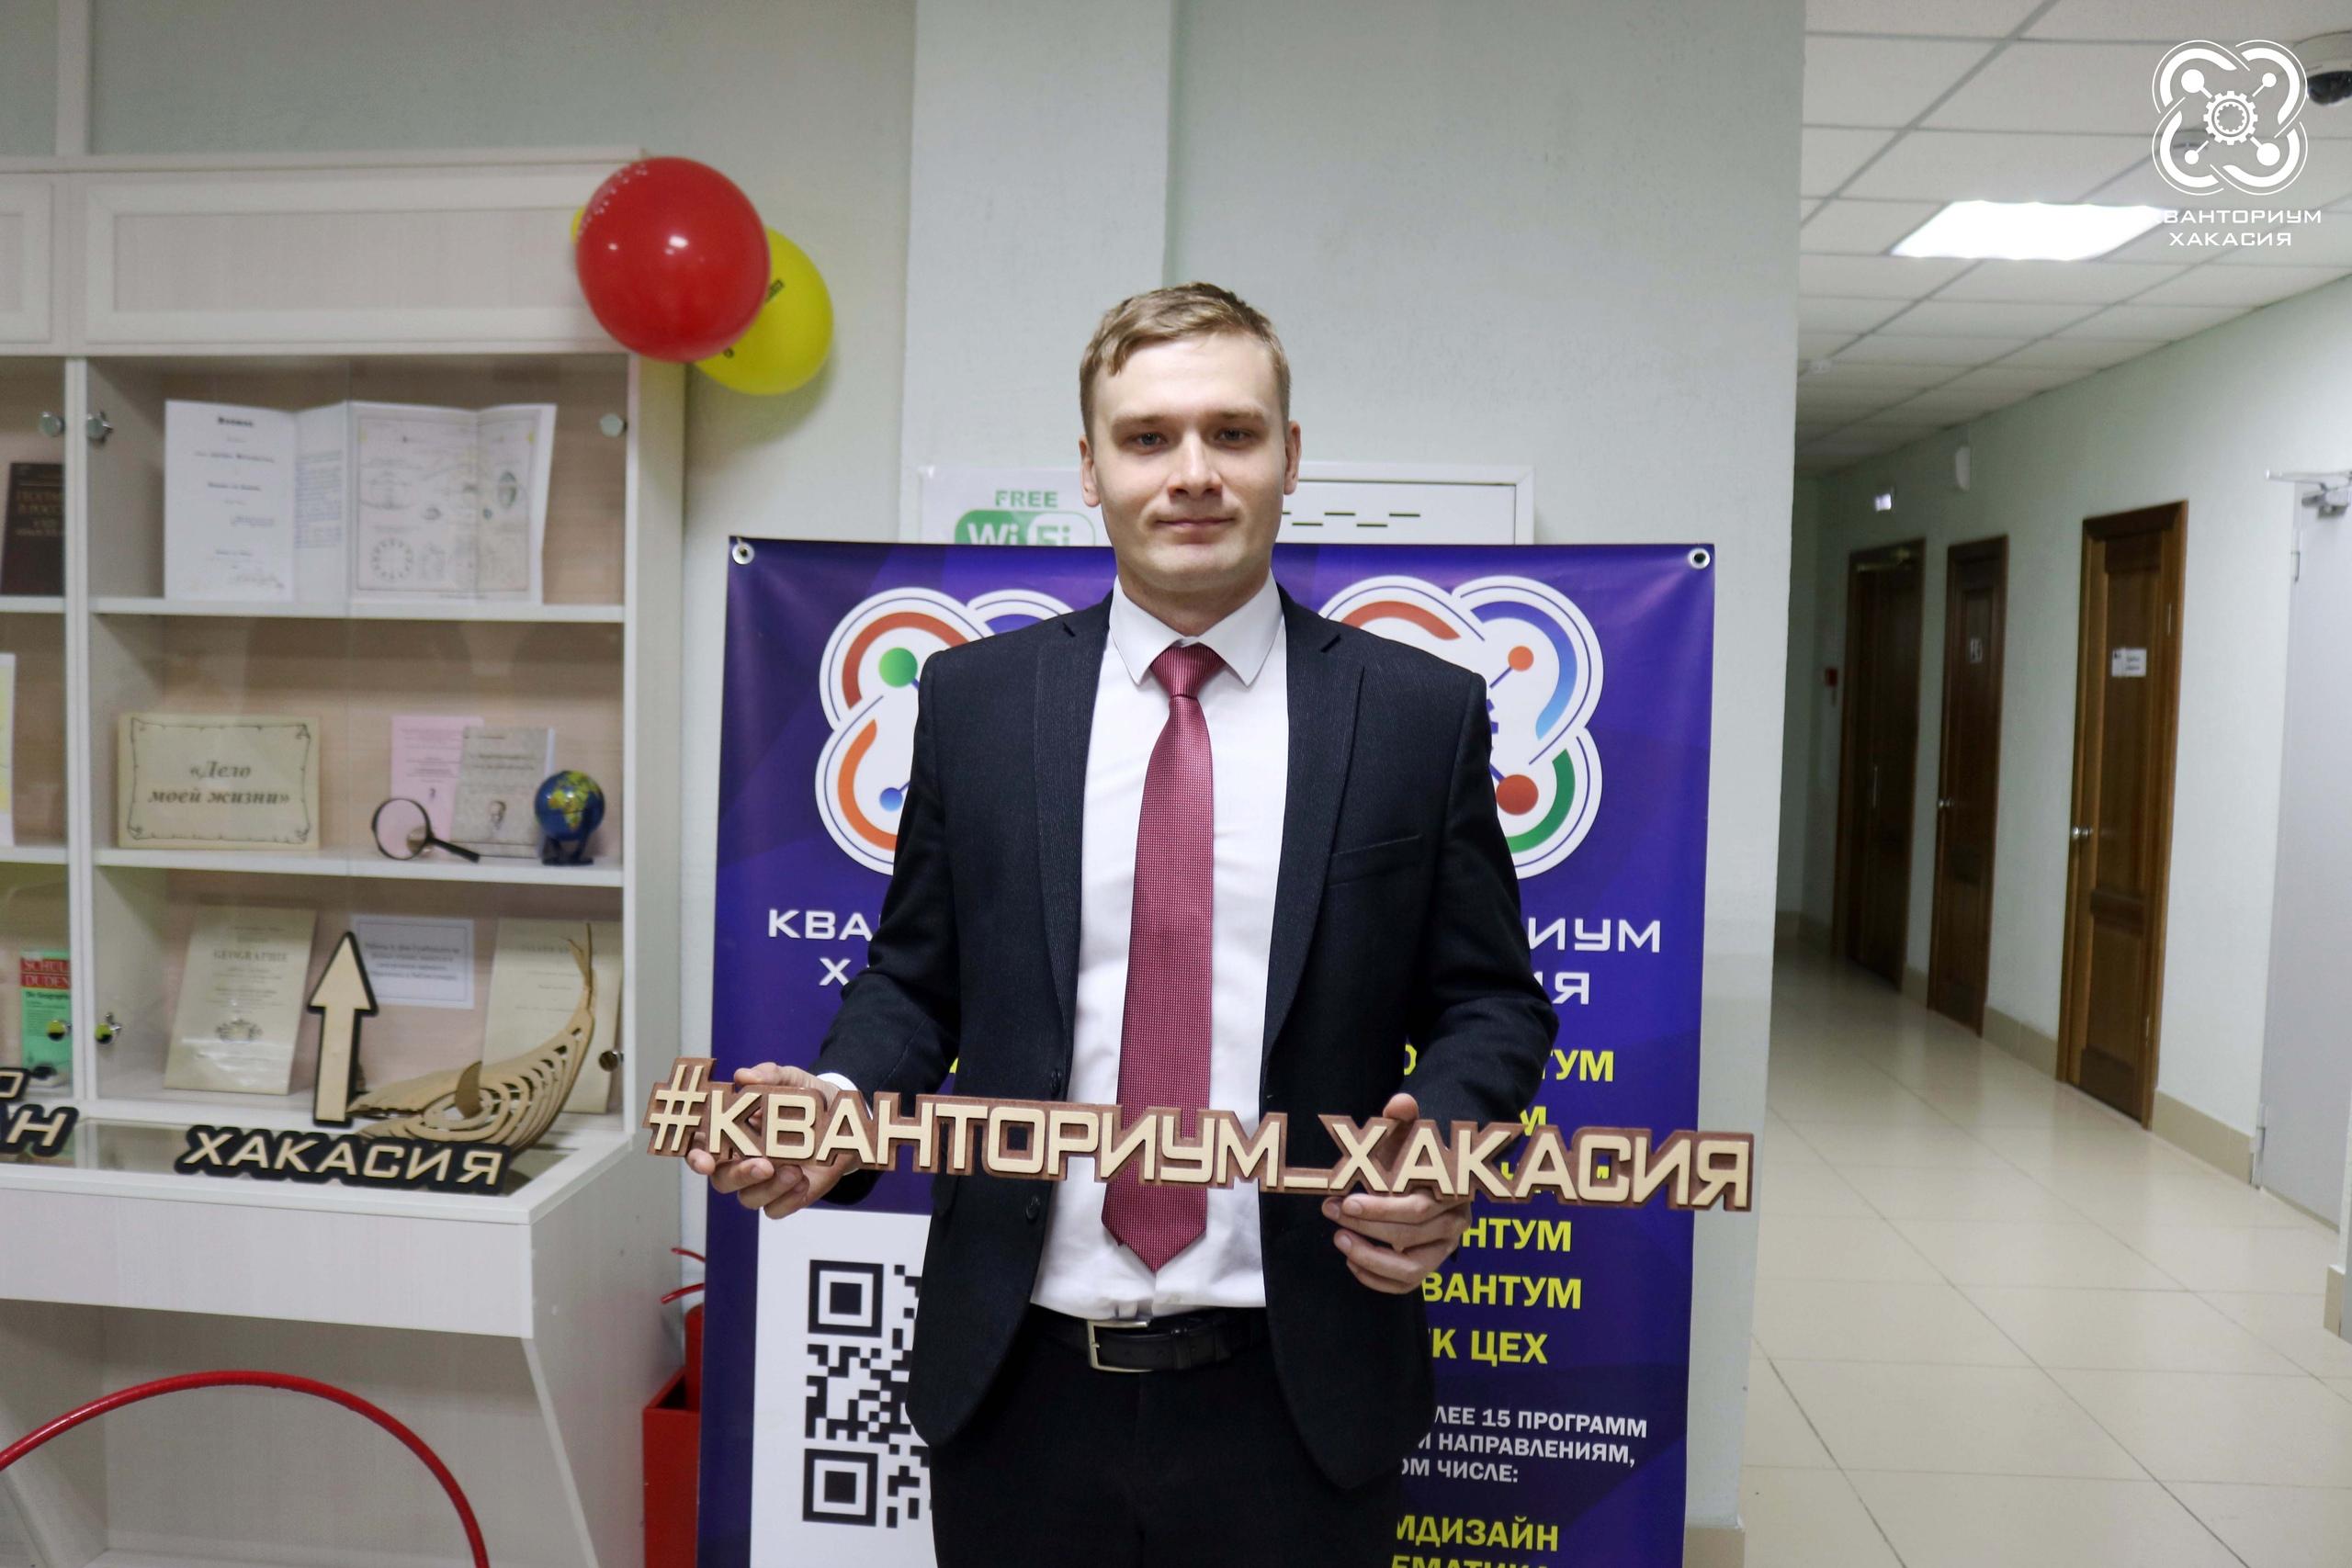 Глава Хакасии посетил выставку «Кванториум «Хакасия» на фестивале «Наука 0+»